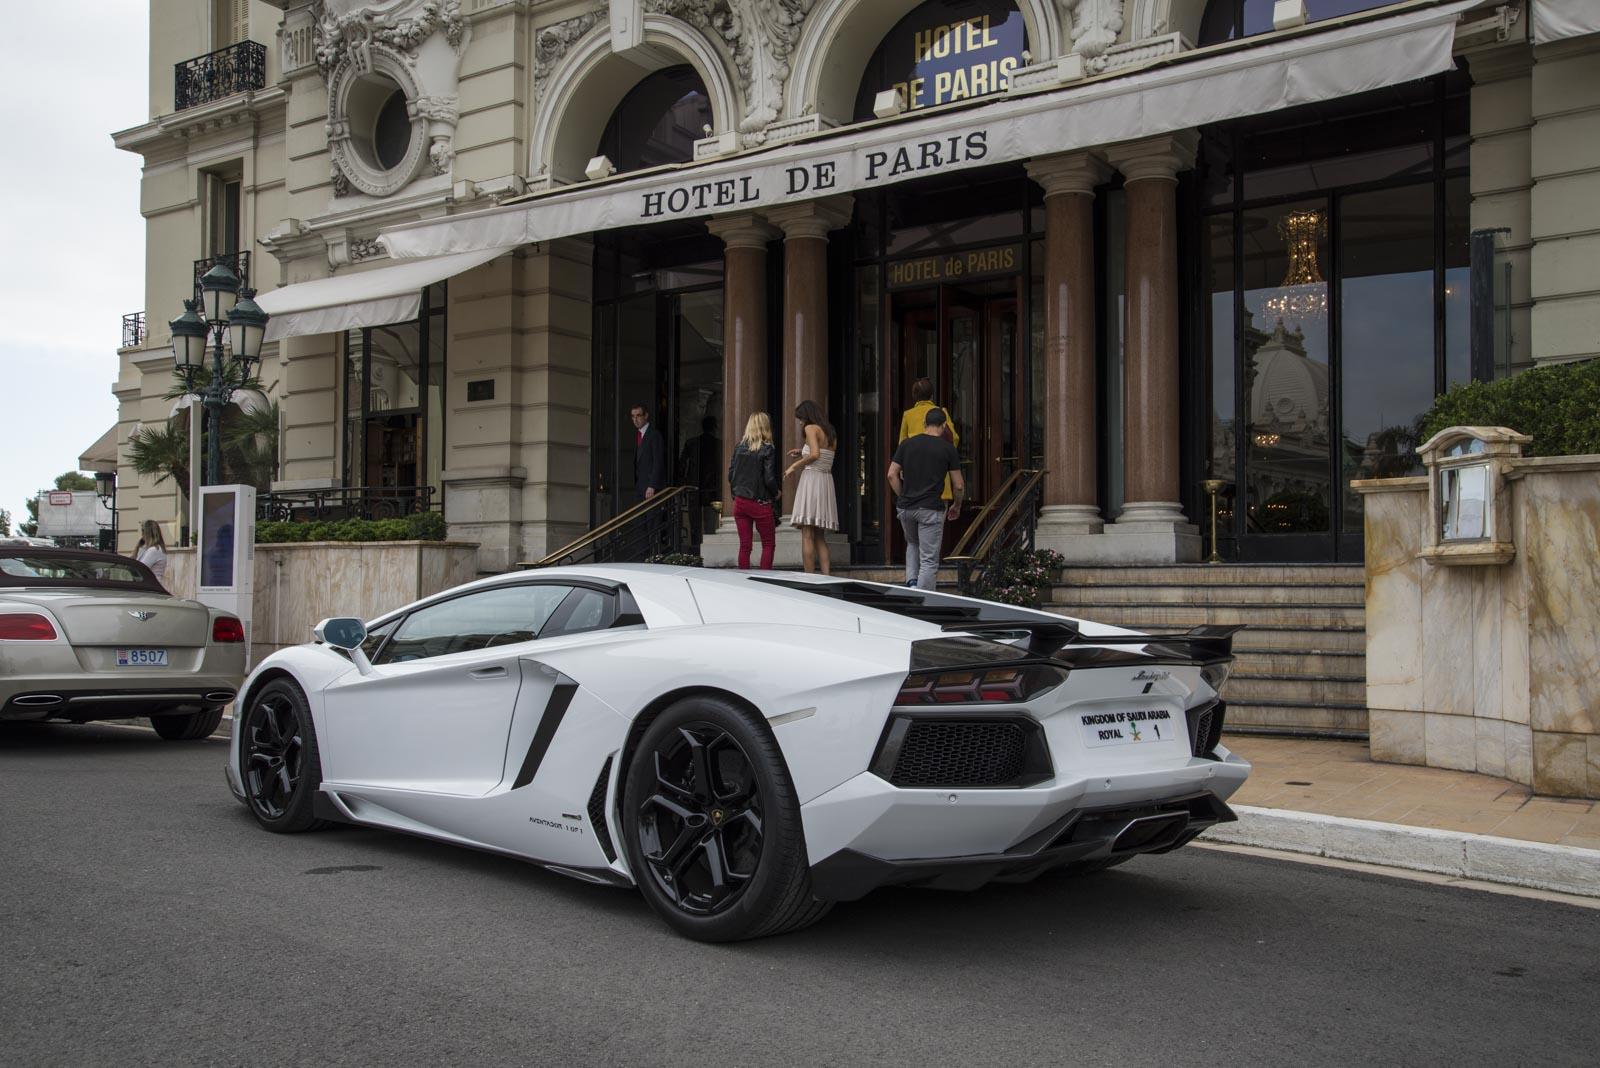 En Lamborghini Aventador hadde fått hedersplassen foran Hotel de Paris denne formiddagen